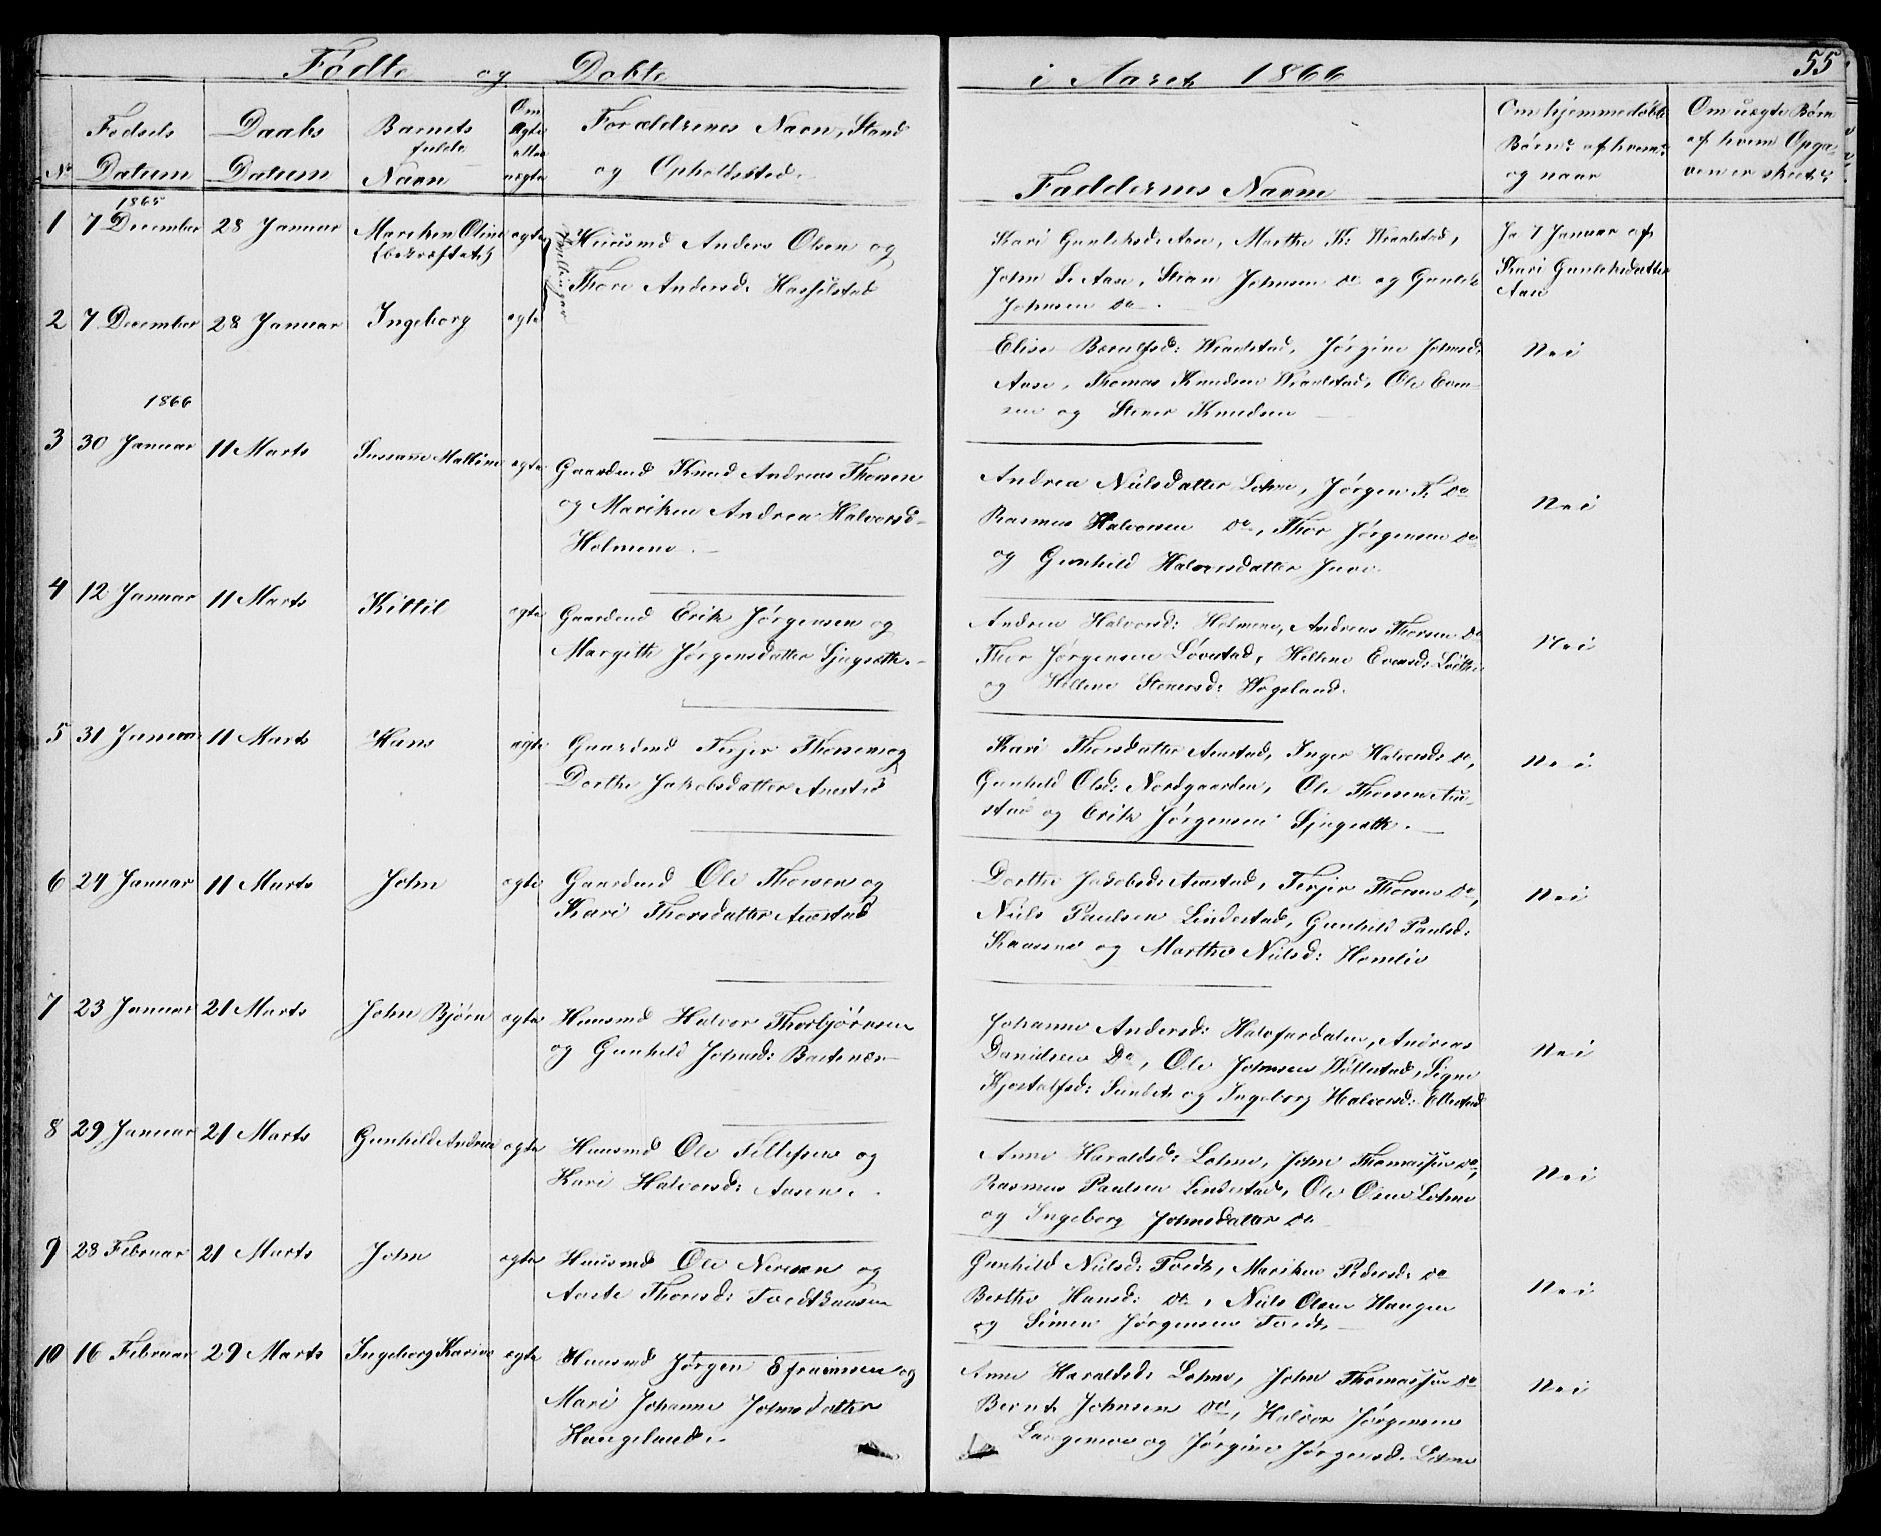 SAKO, Drangedal kirkebøker, G/Gb/L0001: Klokkerbok nr. II 1, 1856-1894, s. 55